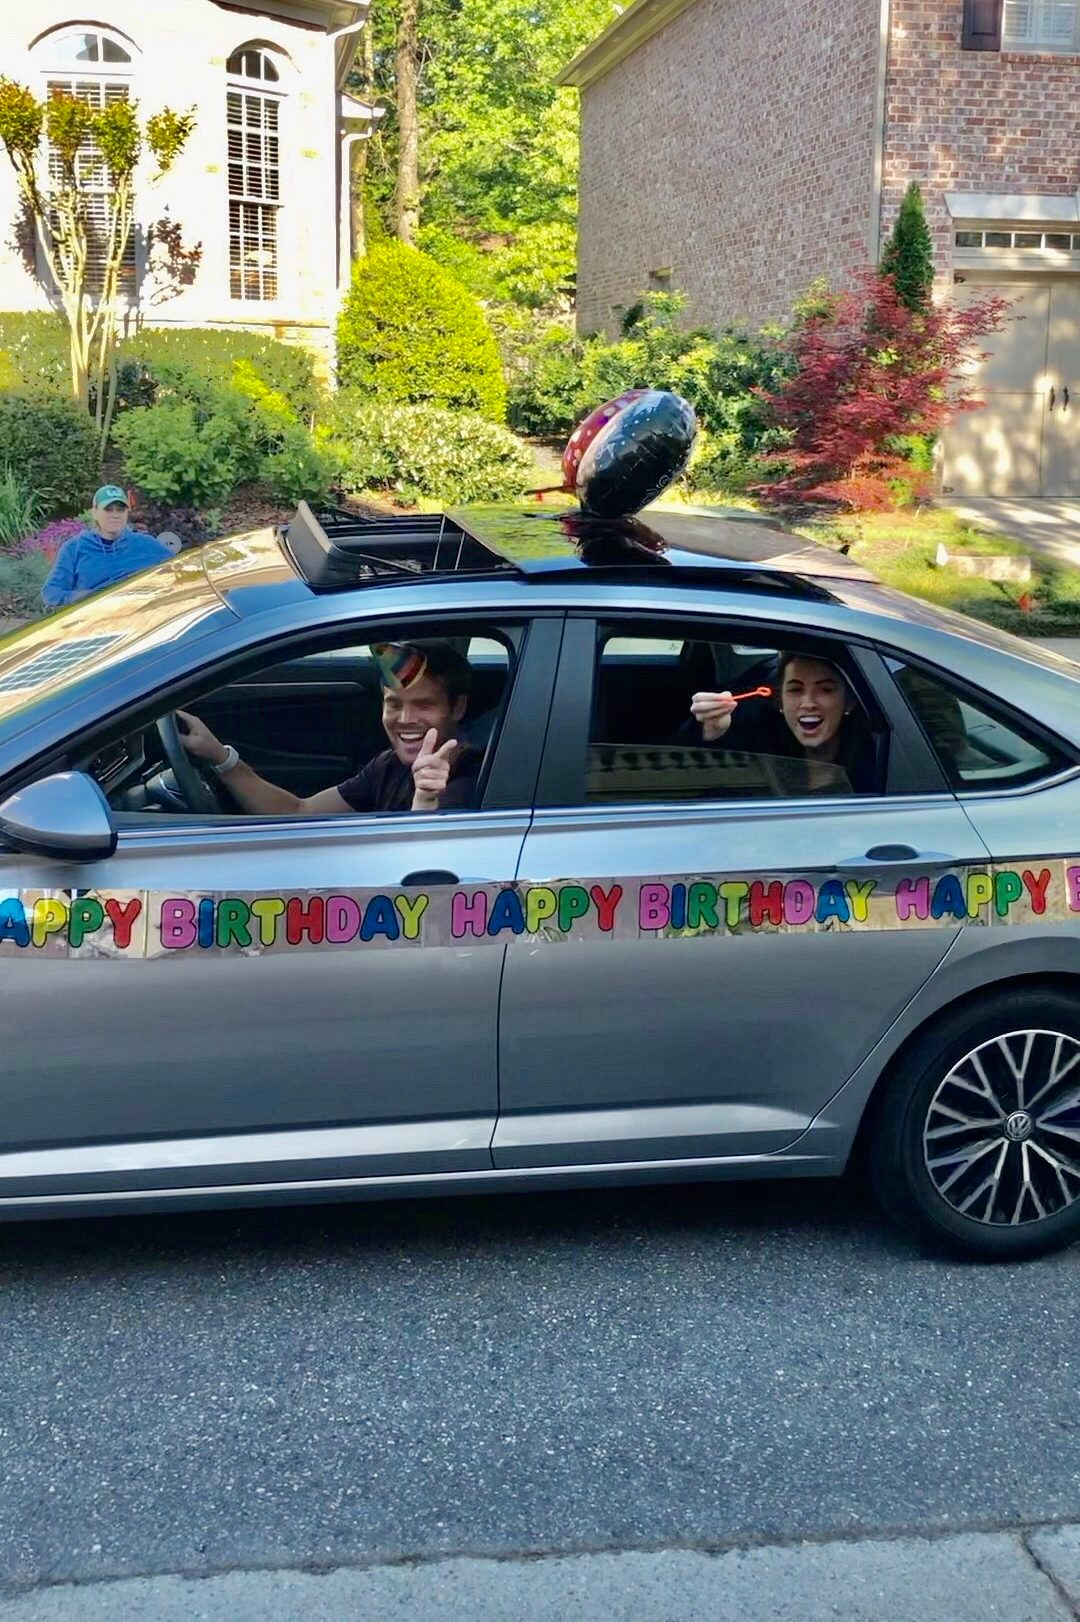 birthday drive by parade